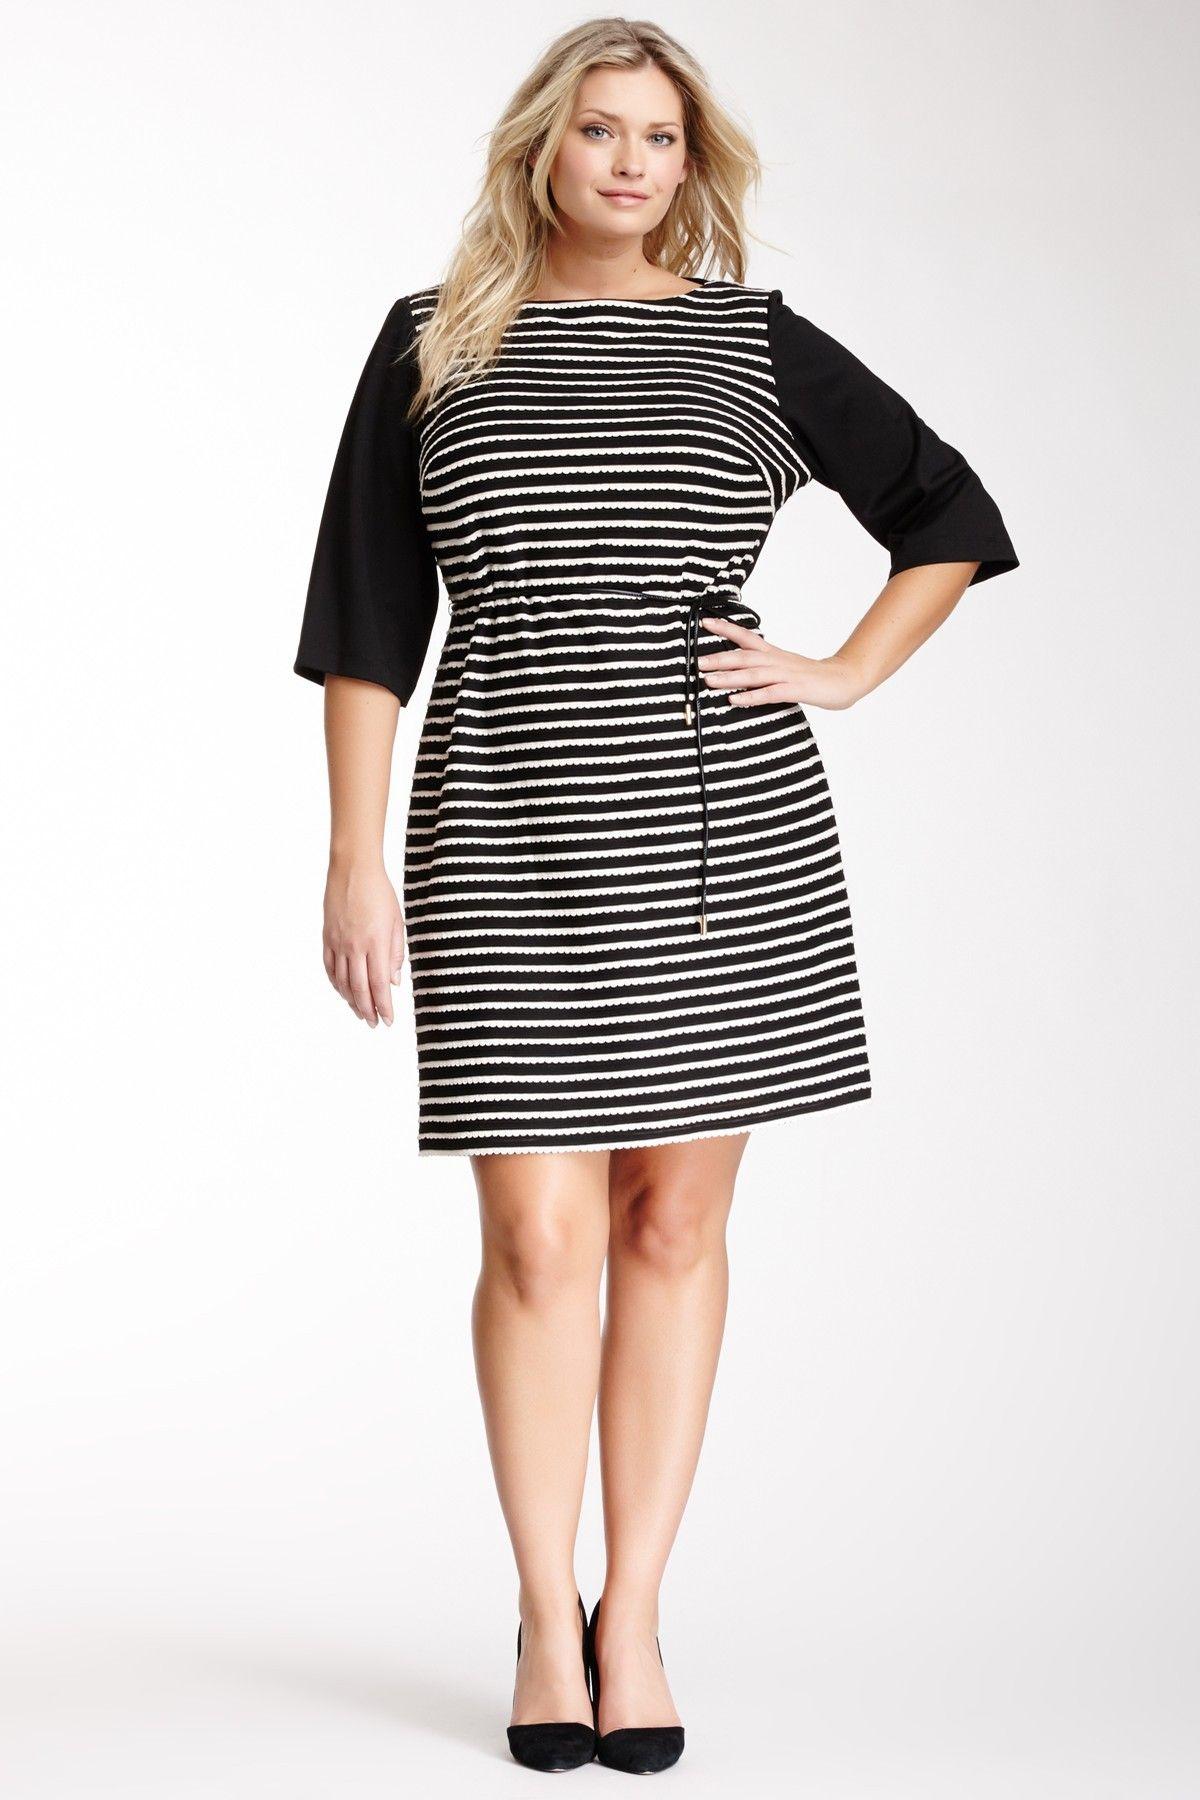 Scalloped Trim Belted Dress - Plus Size   Full figured, Dream ...